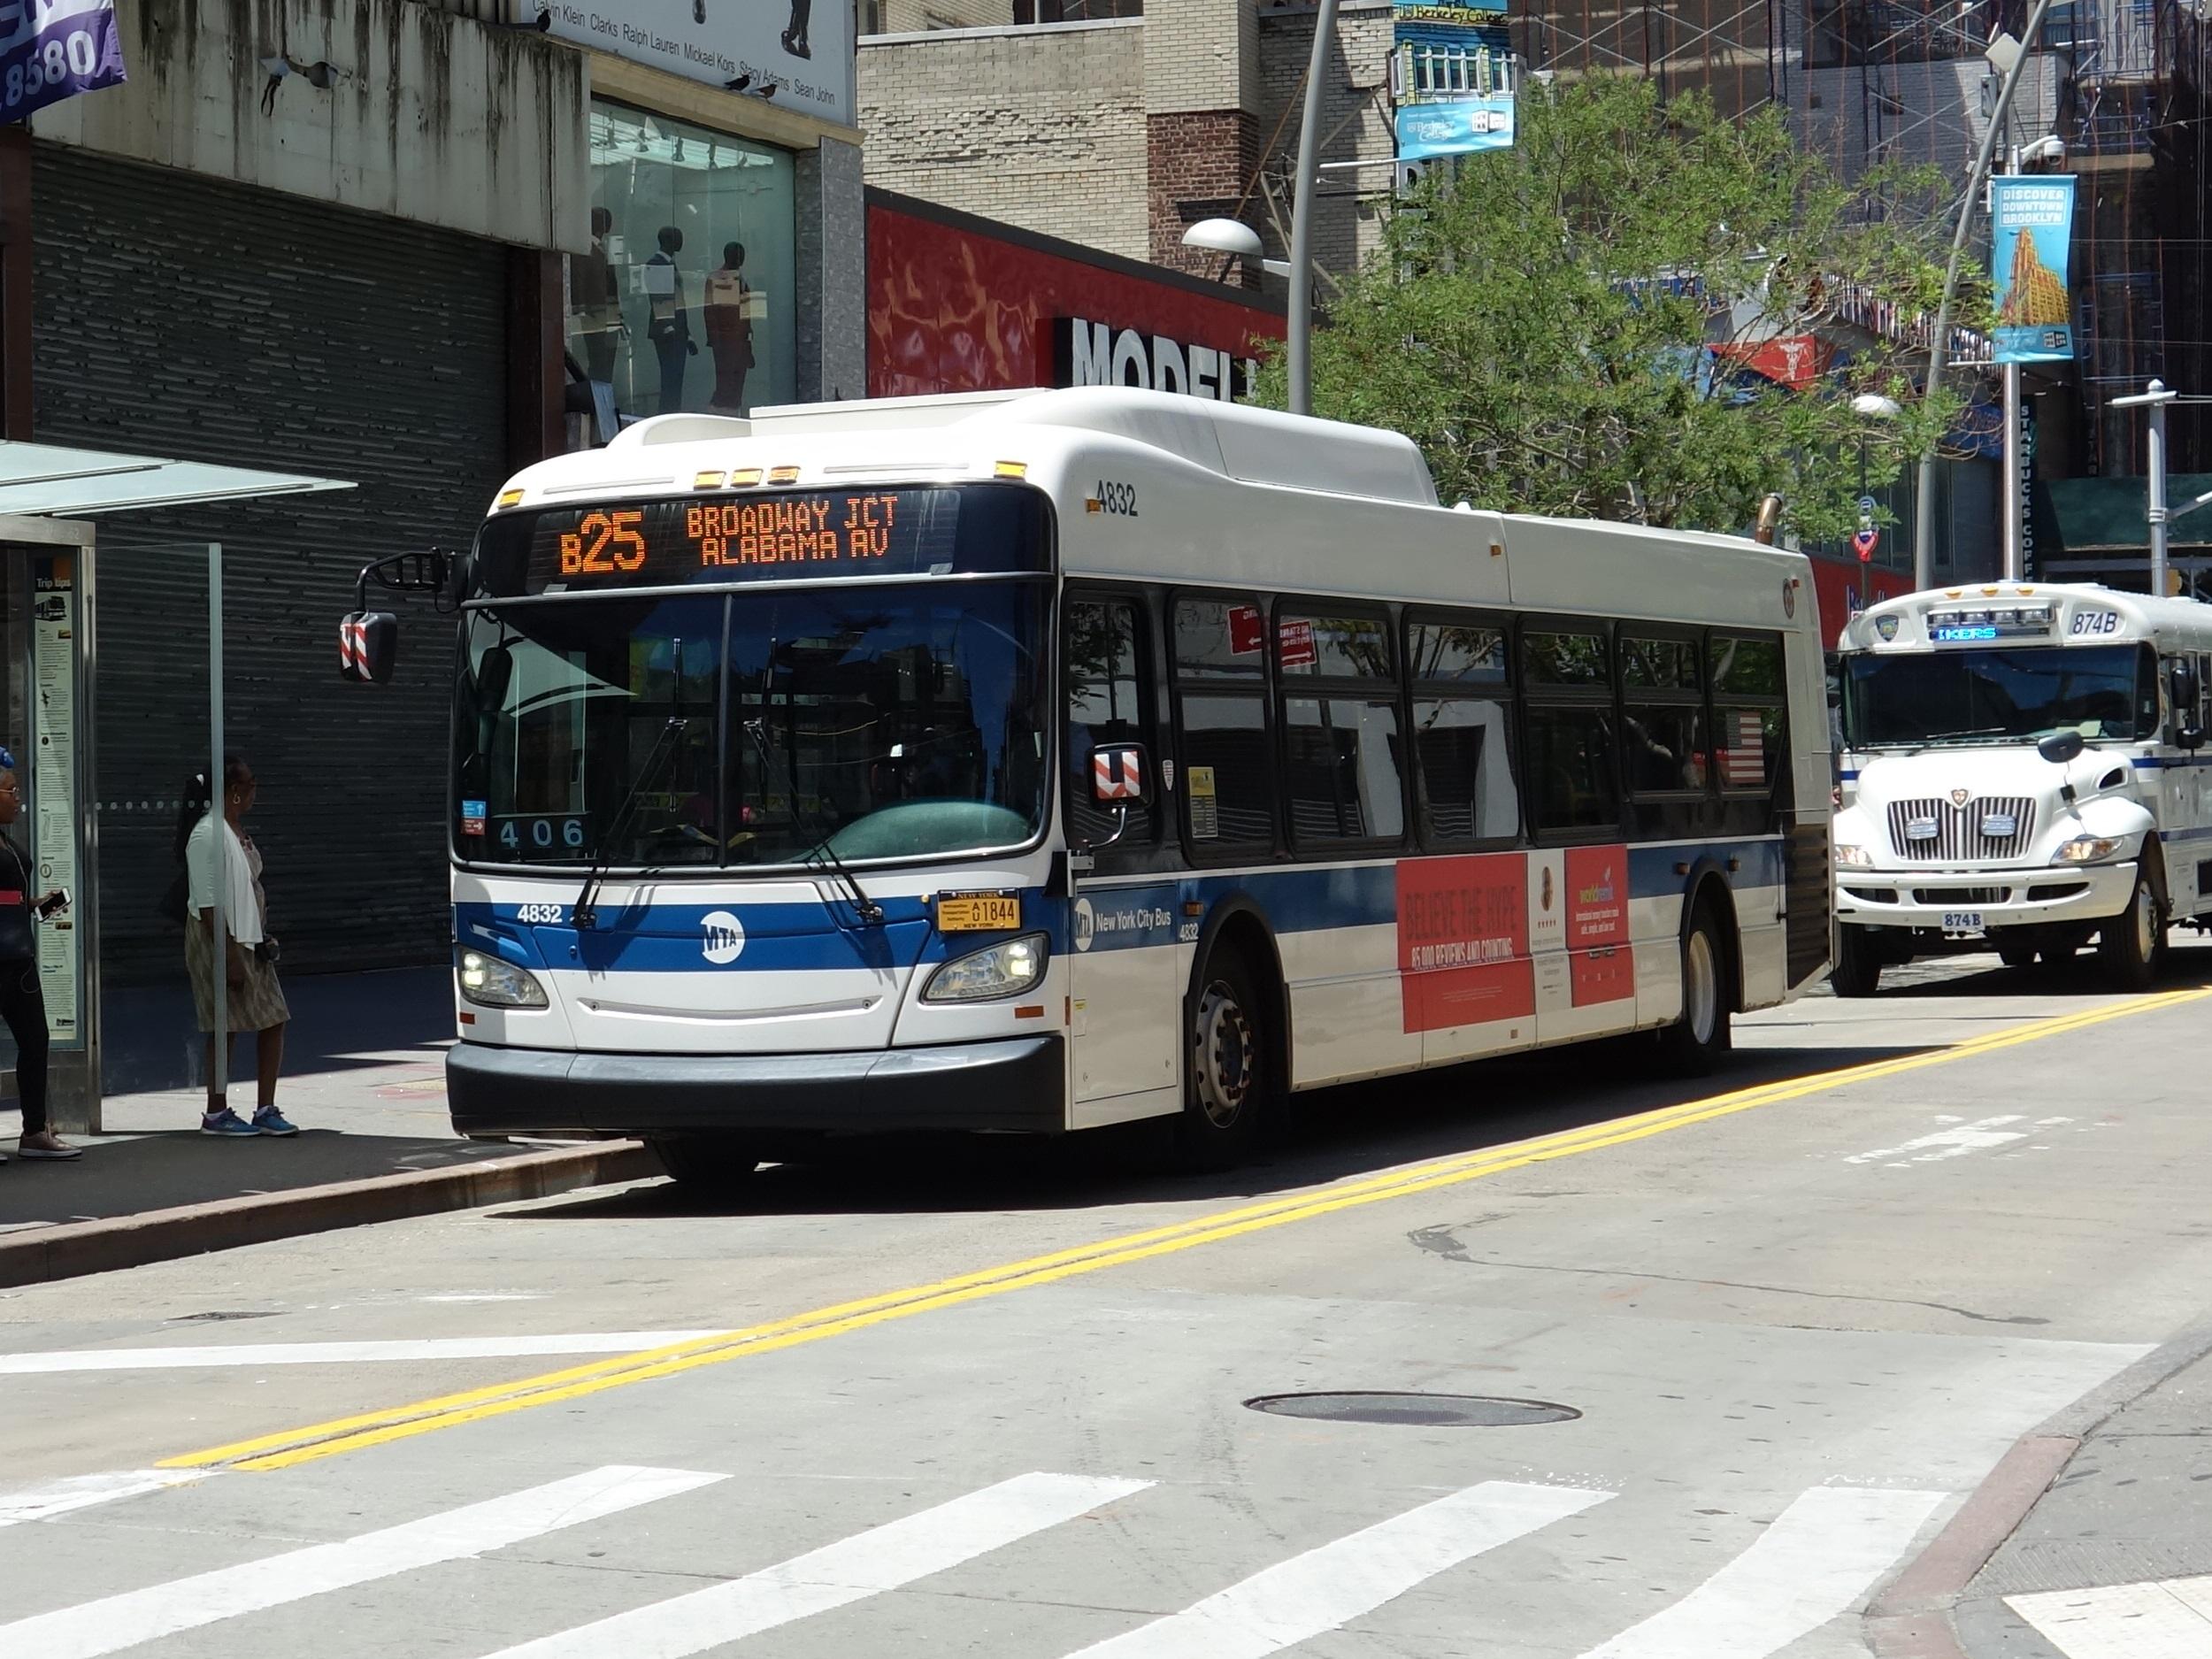 B25 (New York City bus) - Wikipedia B Bus Map on b61 bus, b54 bus, b25 bus, b1 bus, new york city mta bus, b67 bus, b35 bus, b41 bus, q33 bus, b70 bus, b62 bus,